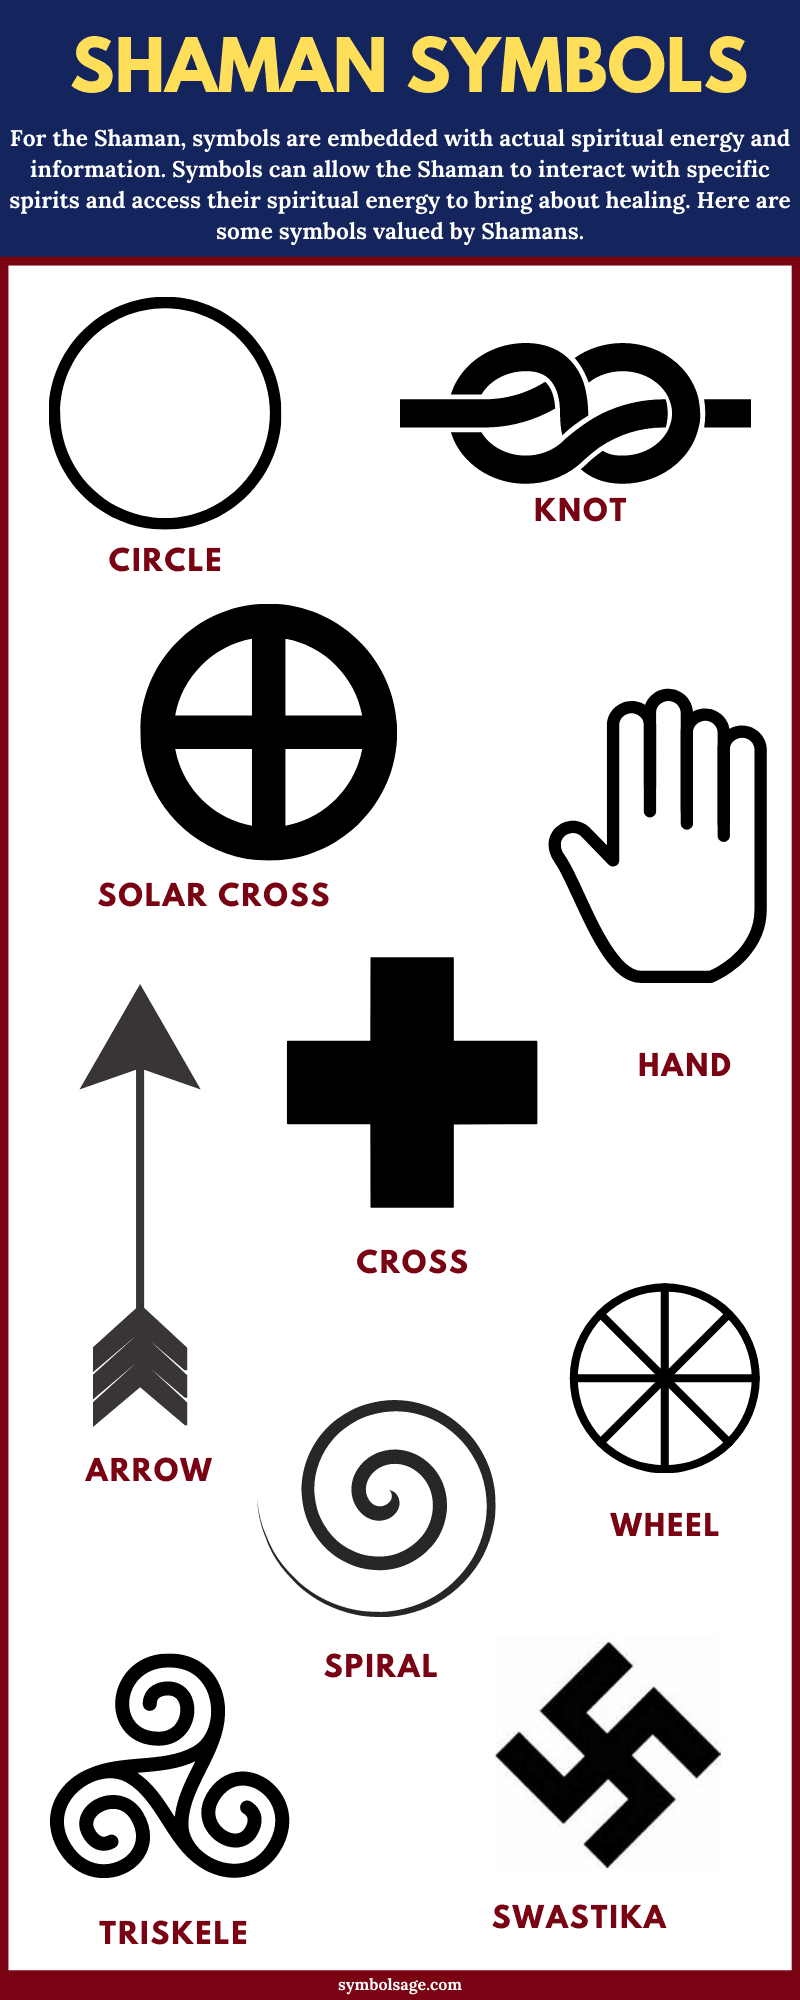 Shaman symbols list